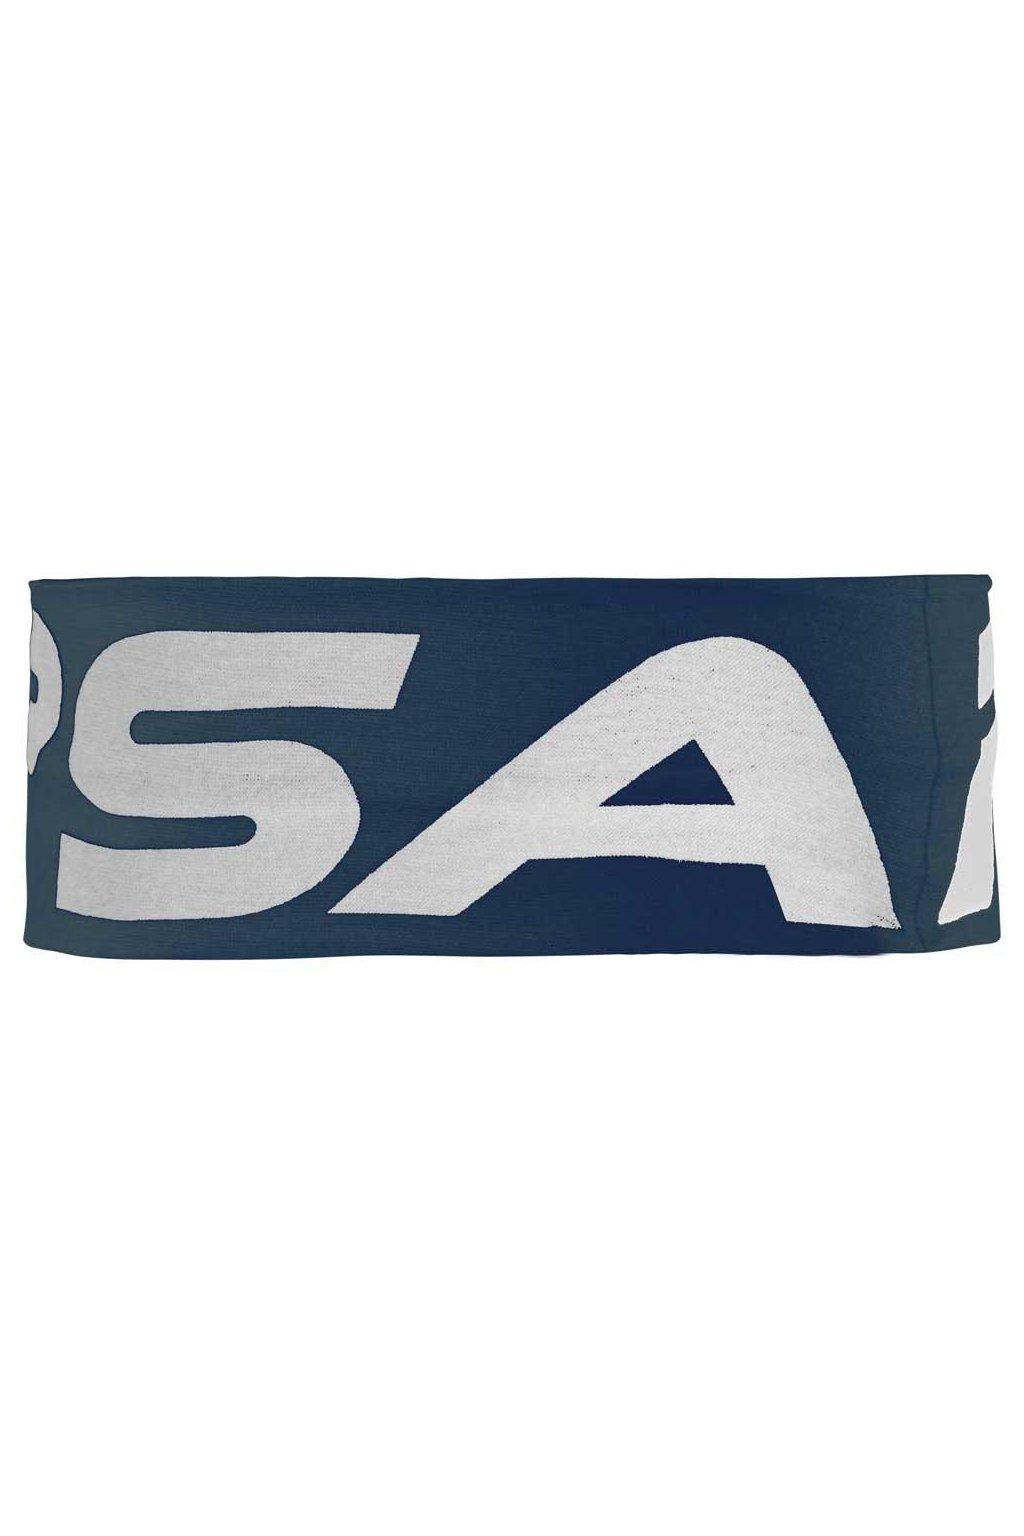 salming psa headband